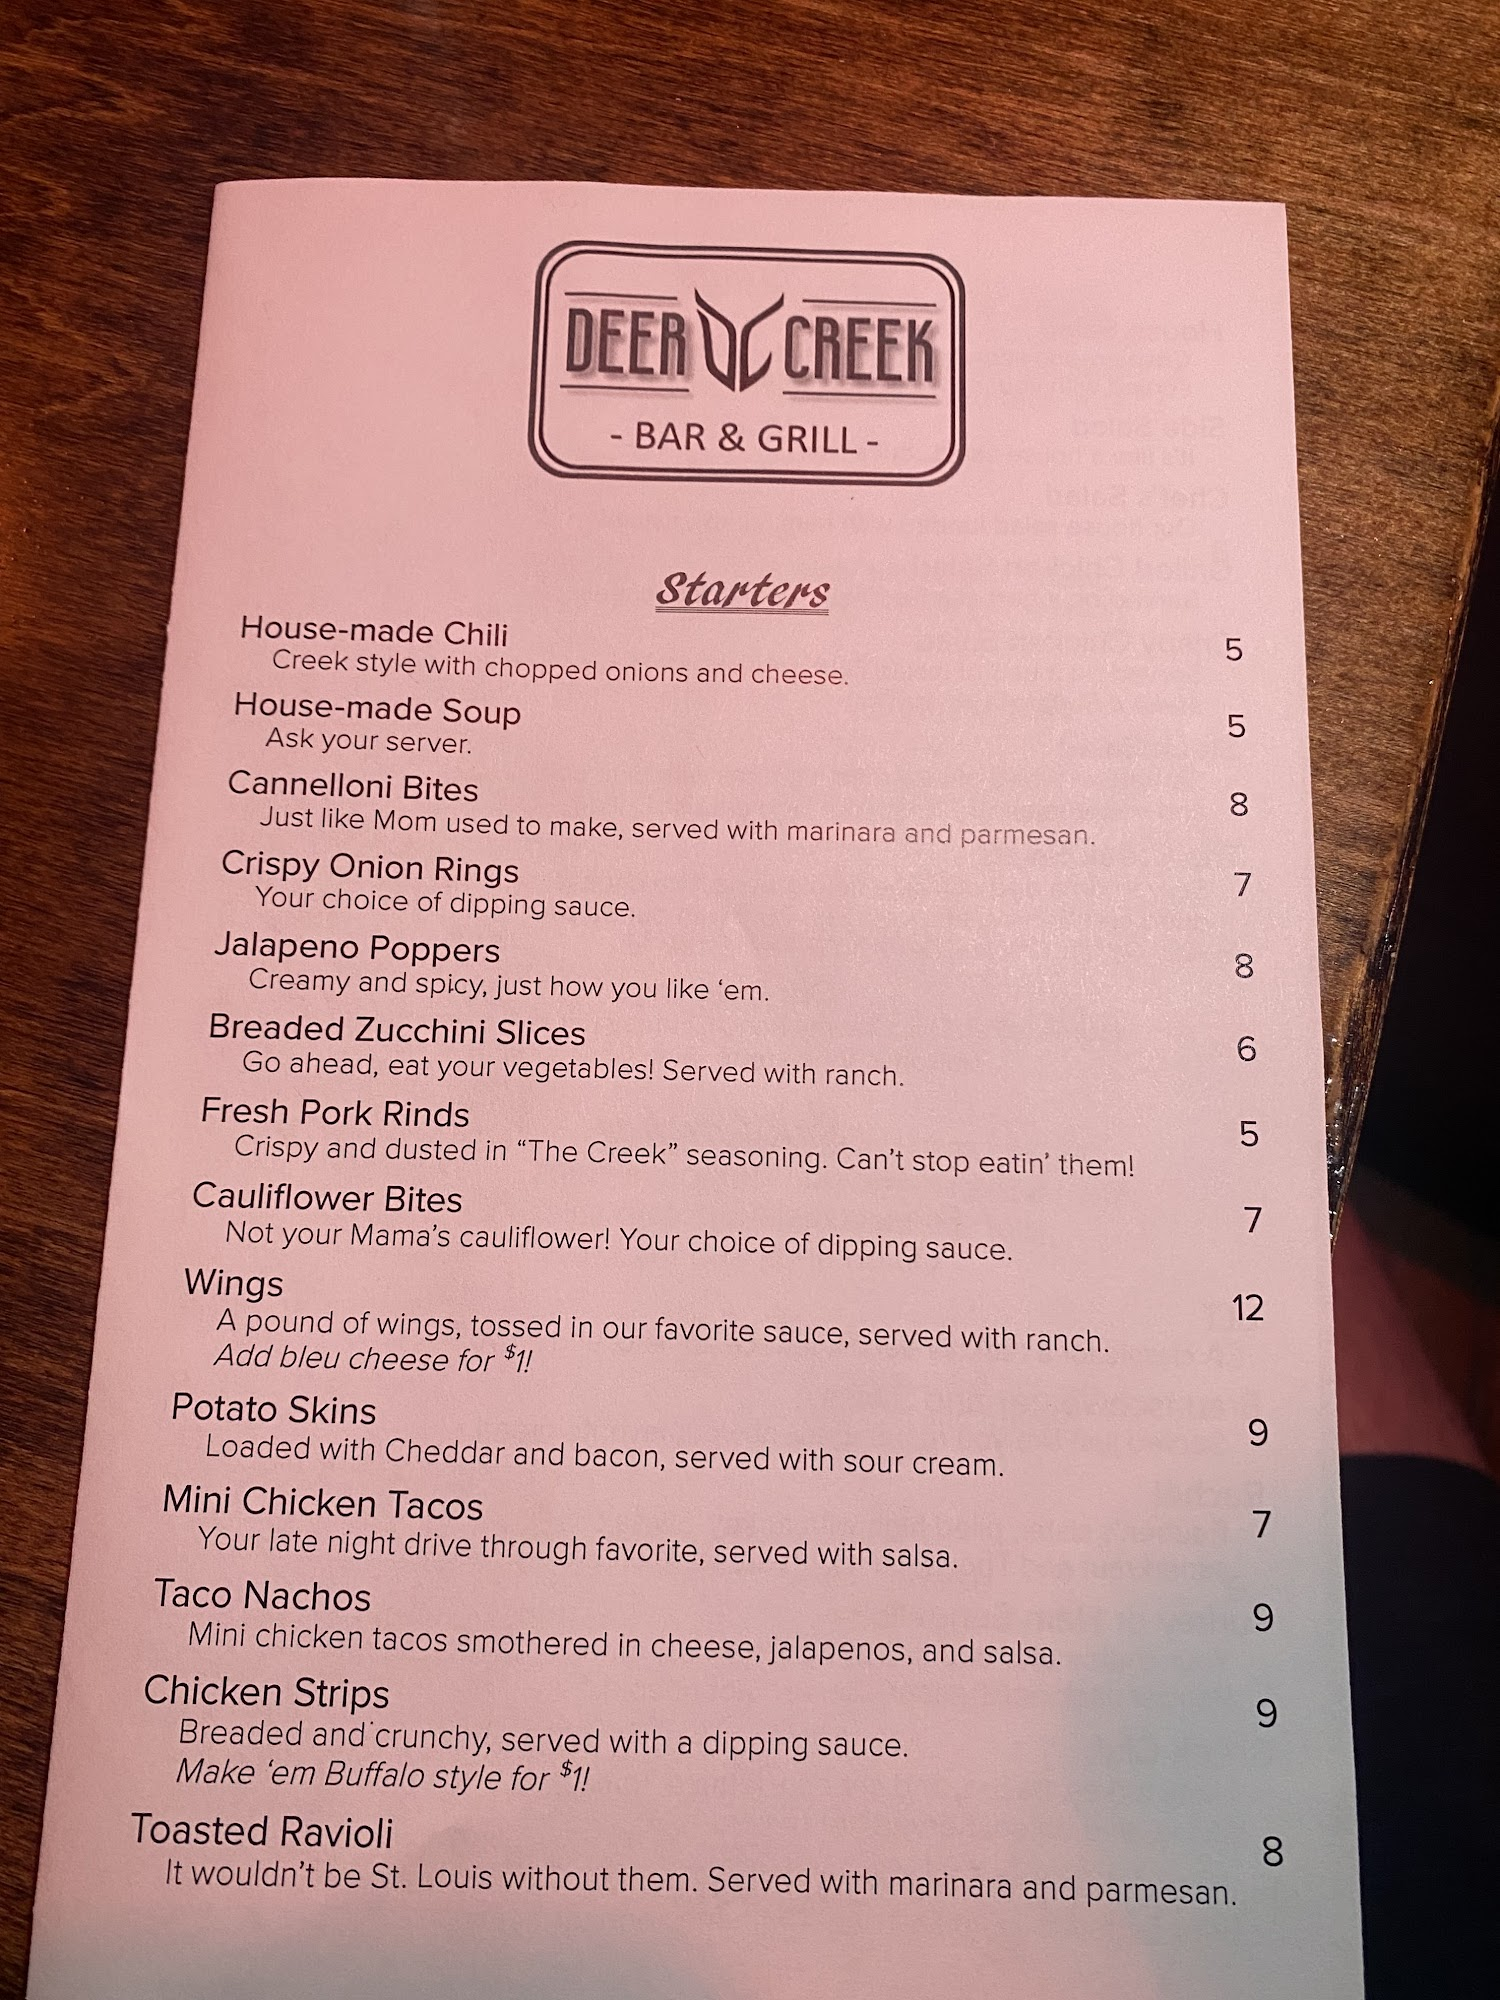 Deer Creek Bar & Grill 3233 Laclede Station Rd, Maplewood